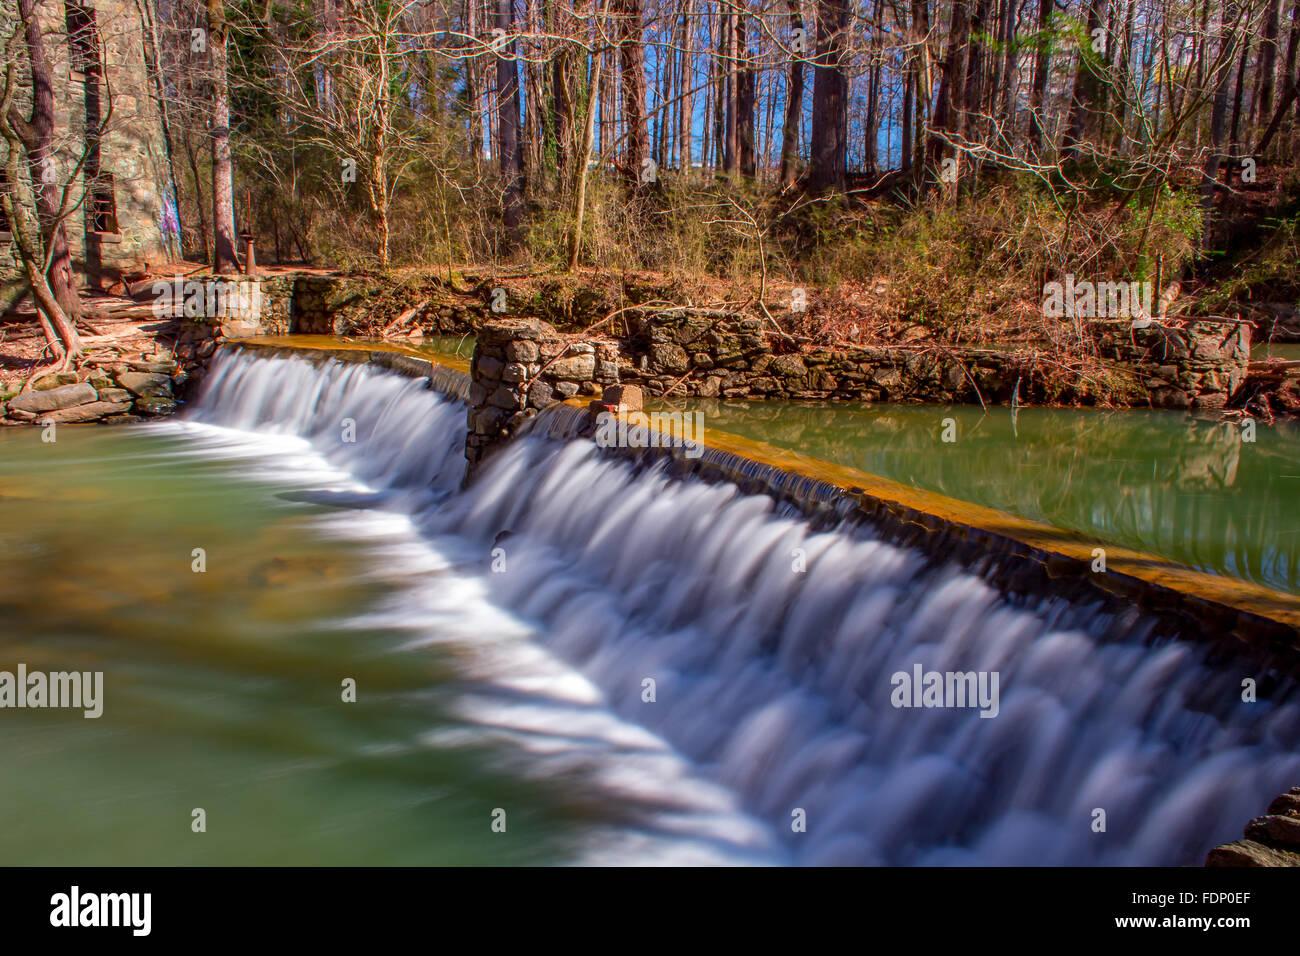 Lullwater Waterfall Spillway Stock Photo